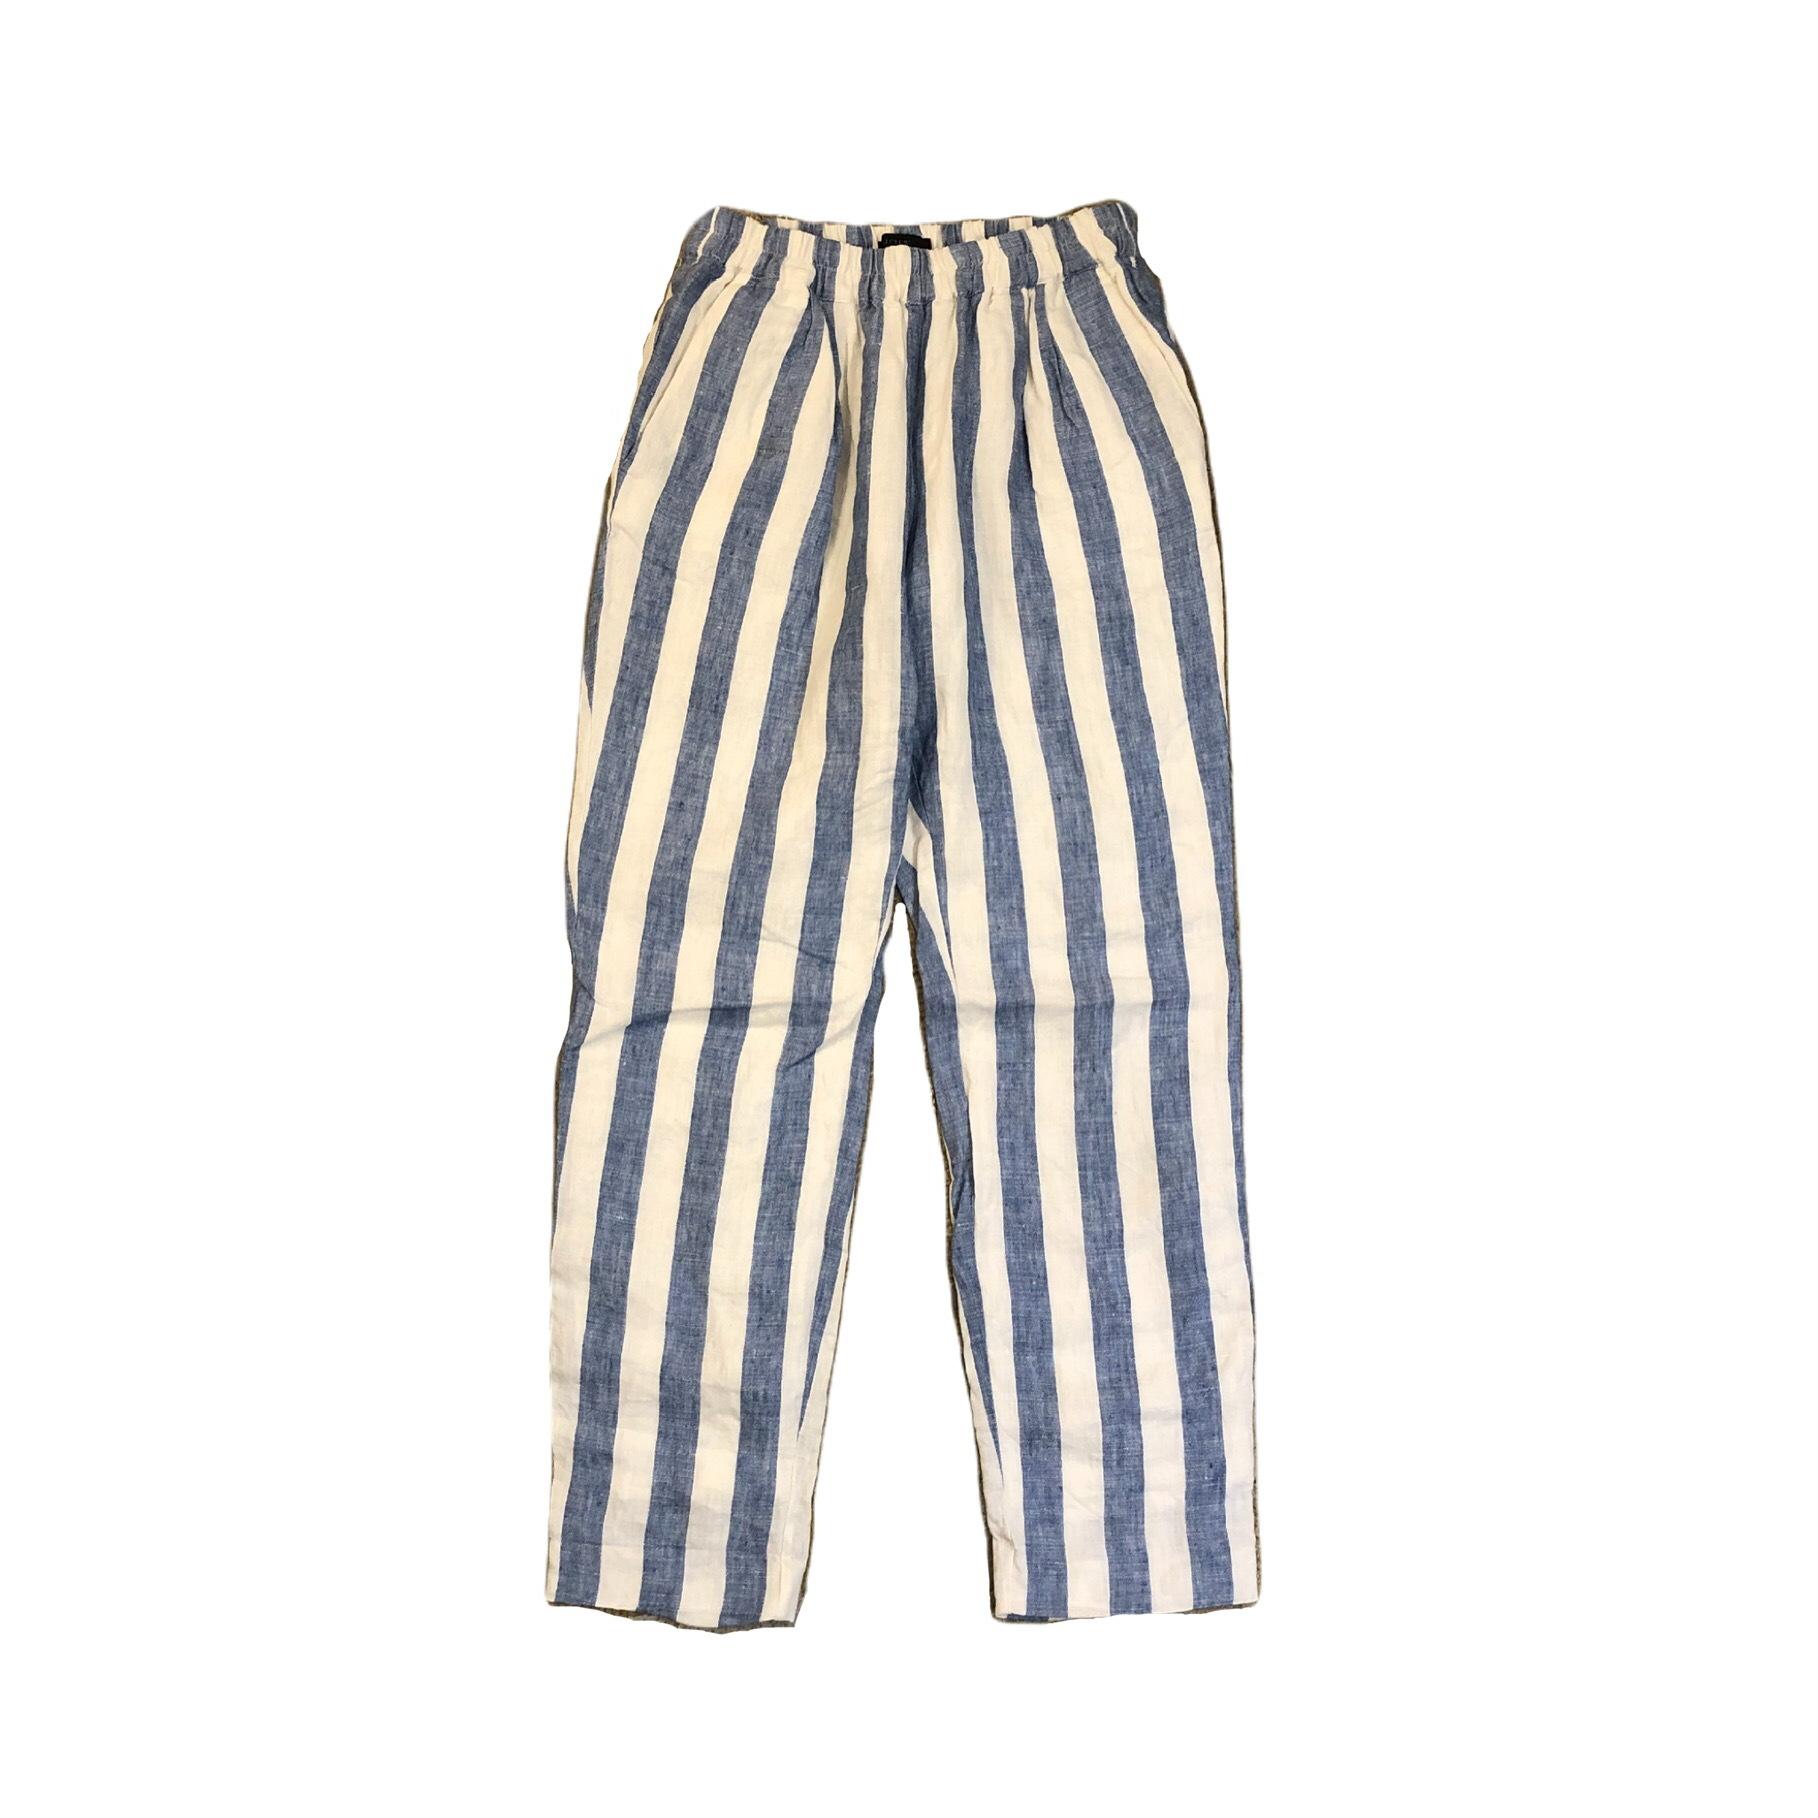 J.crew Stripe Easy Pants ¥6,300+tax